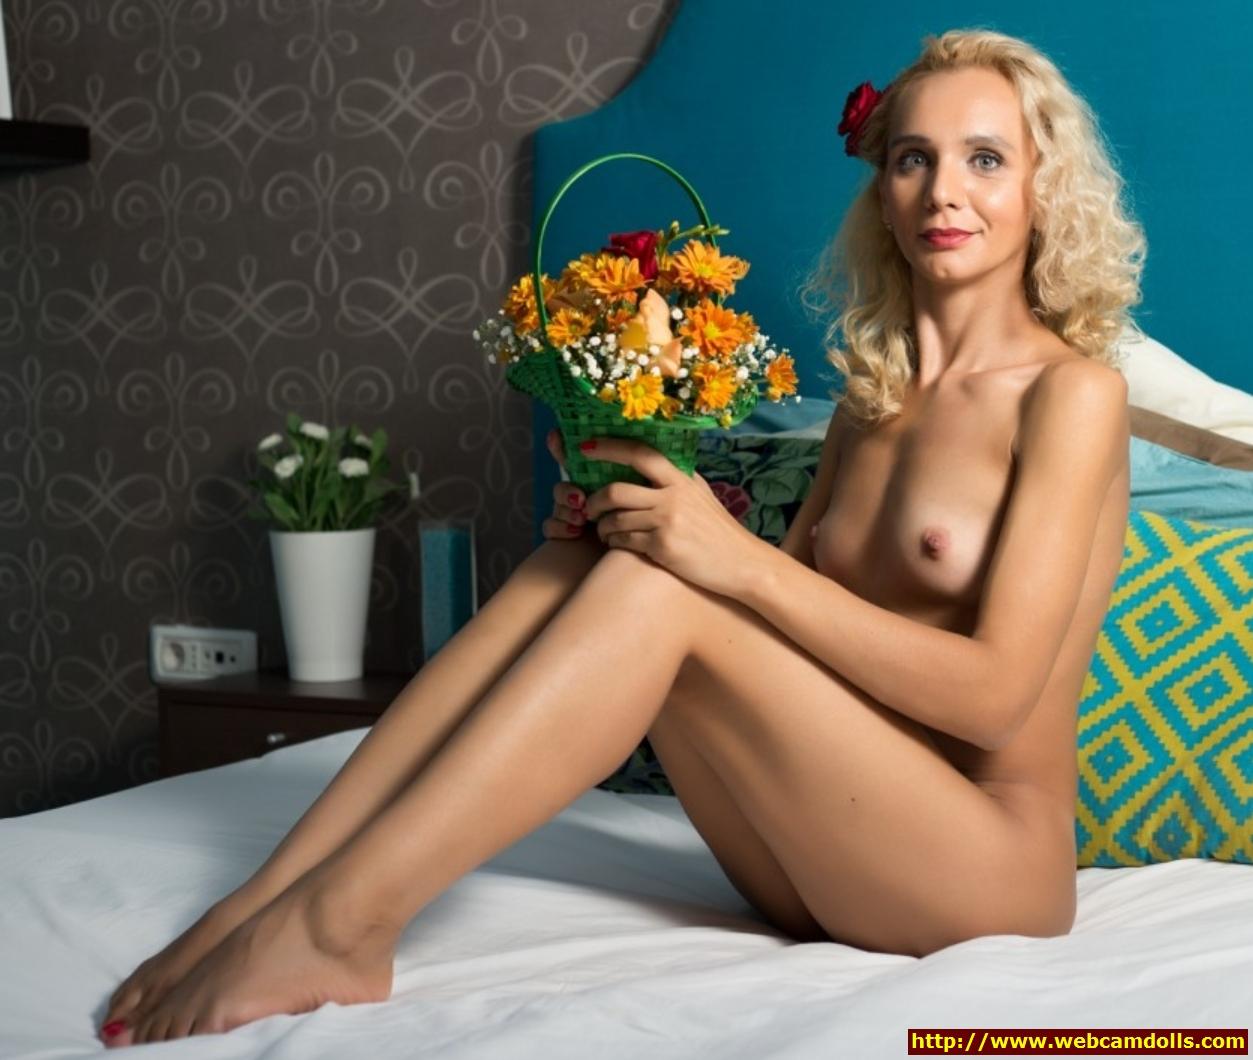 blonde milf nude in her bed on webcamdolls